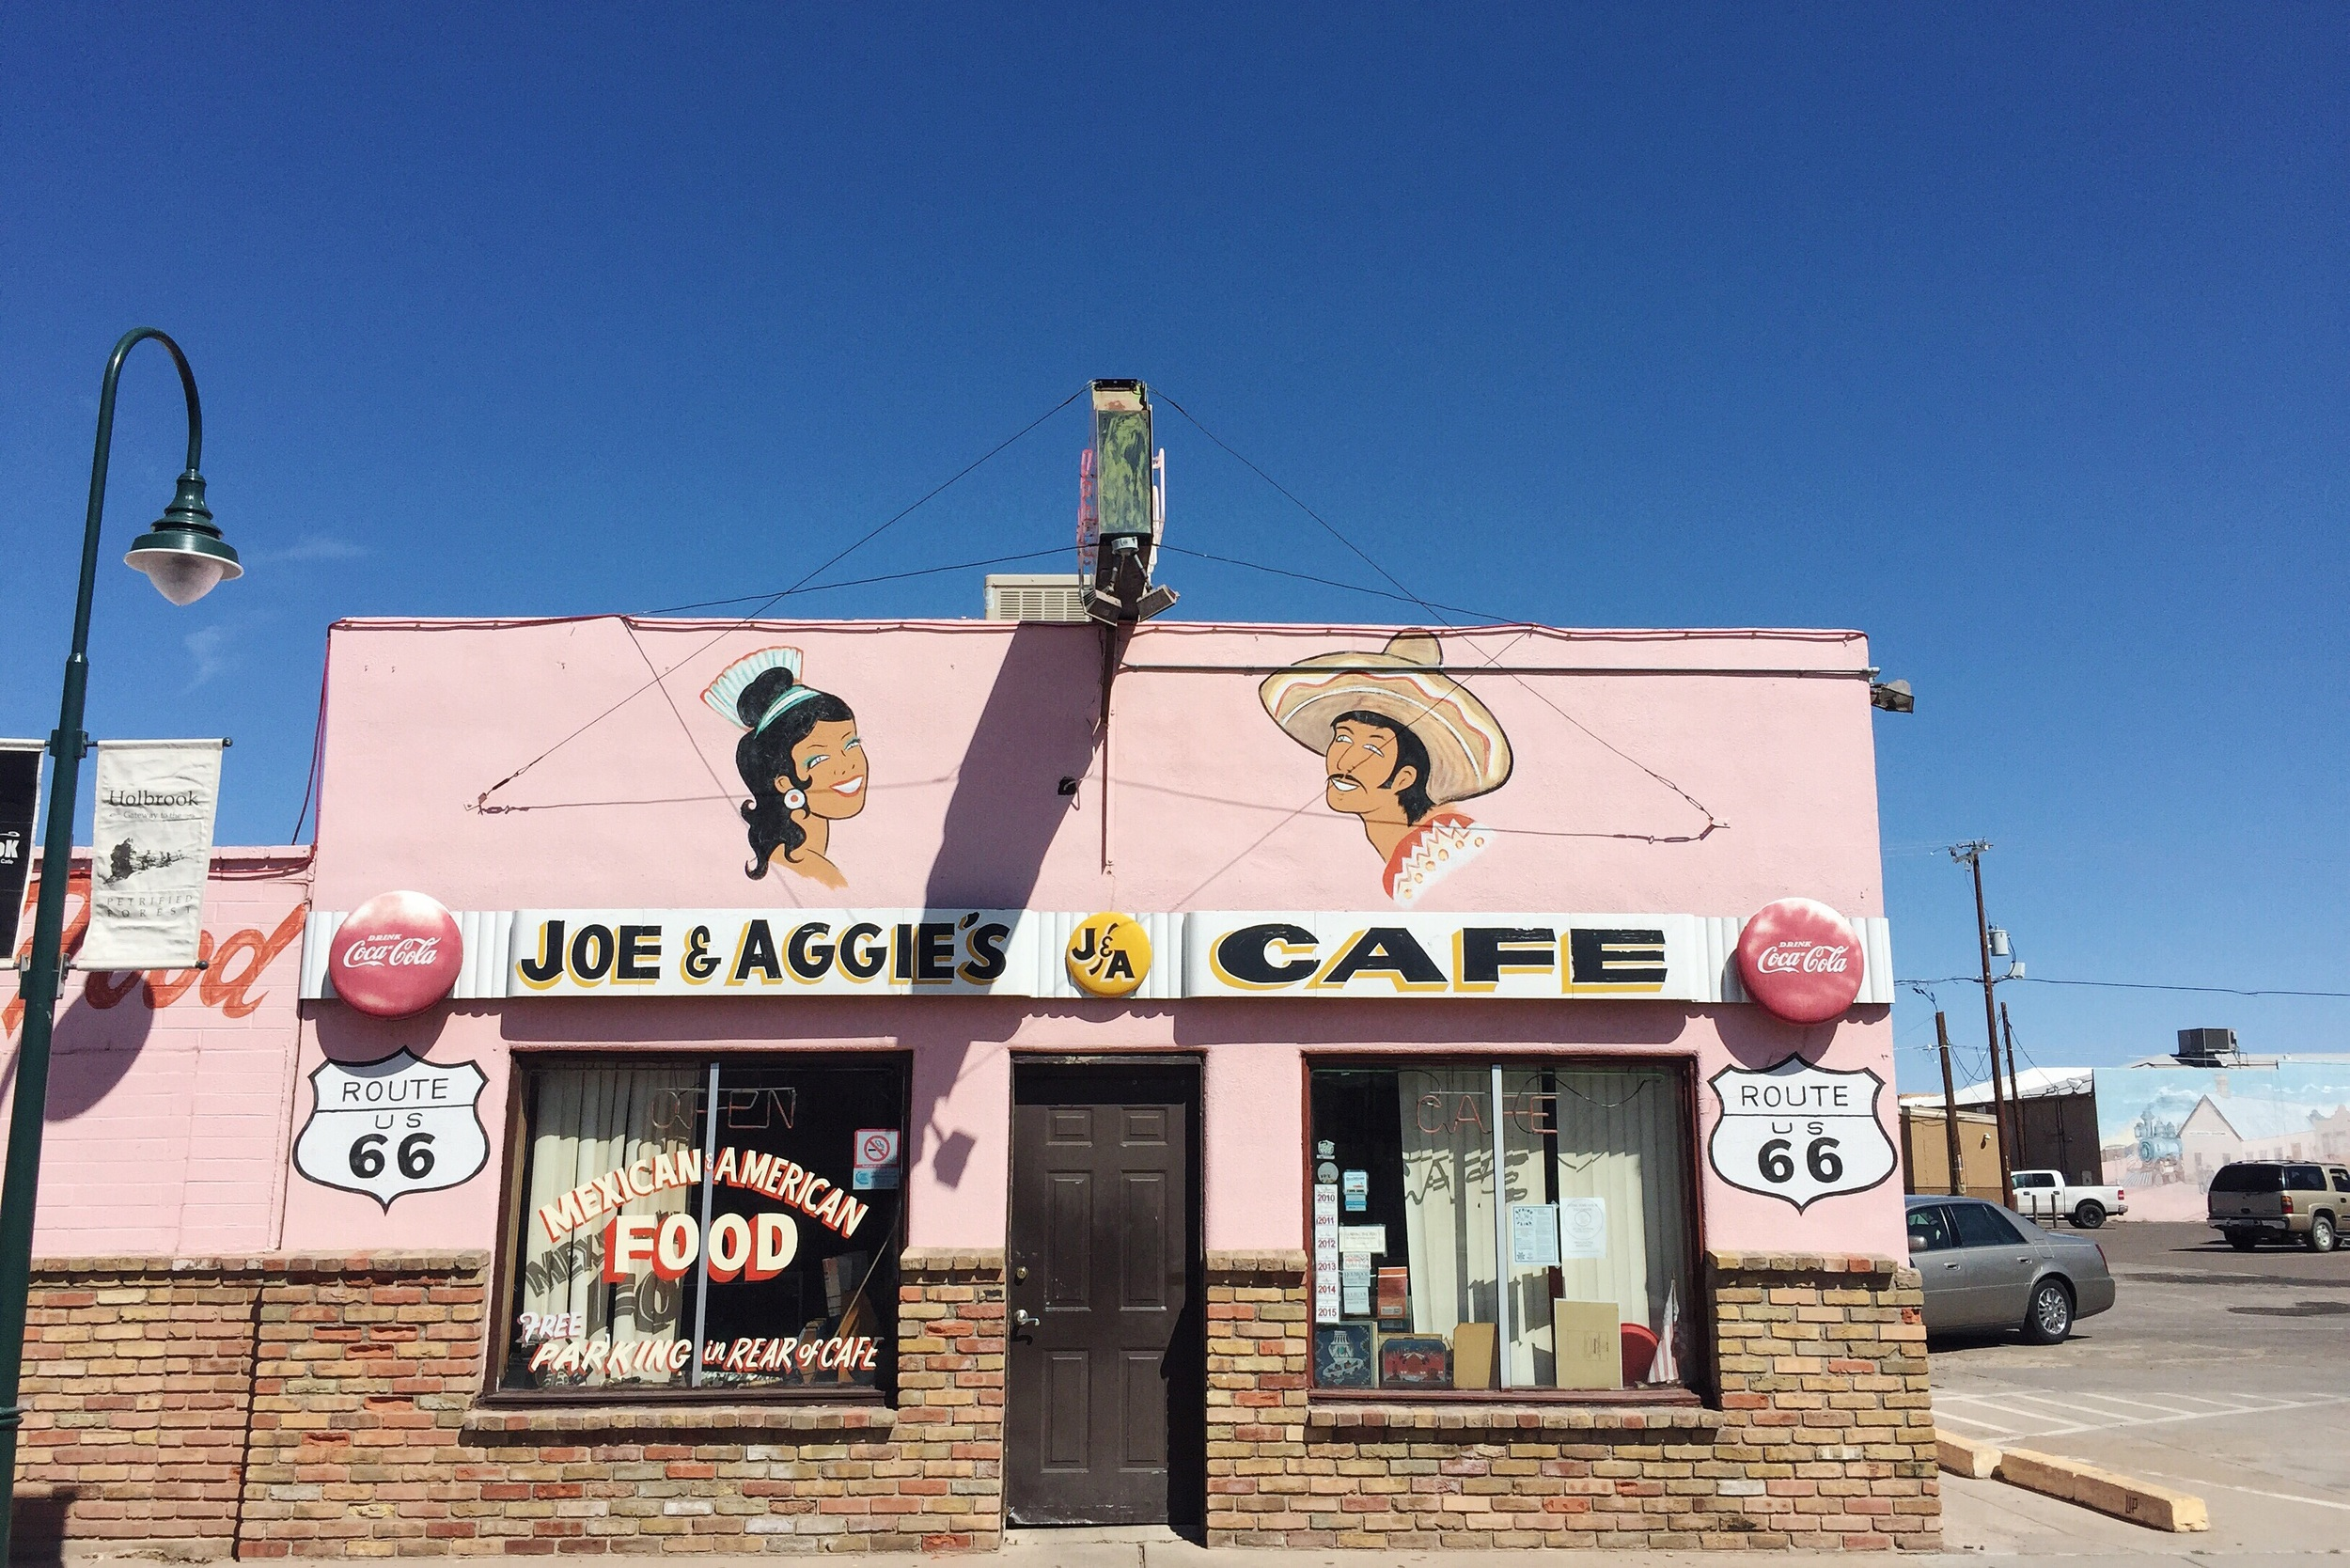 Joe & Aggie's in Holbrook, AZ